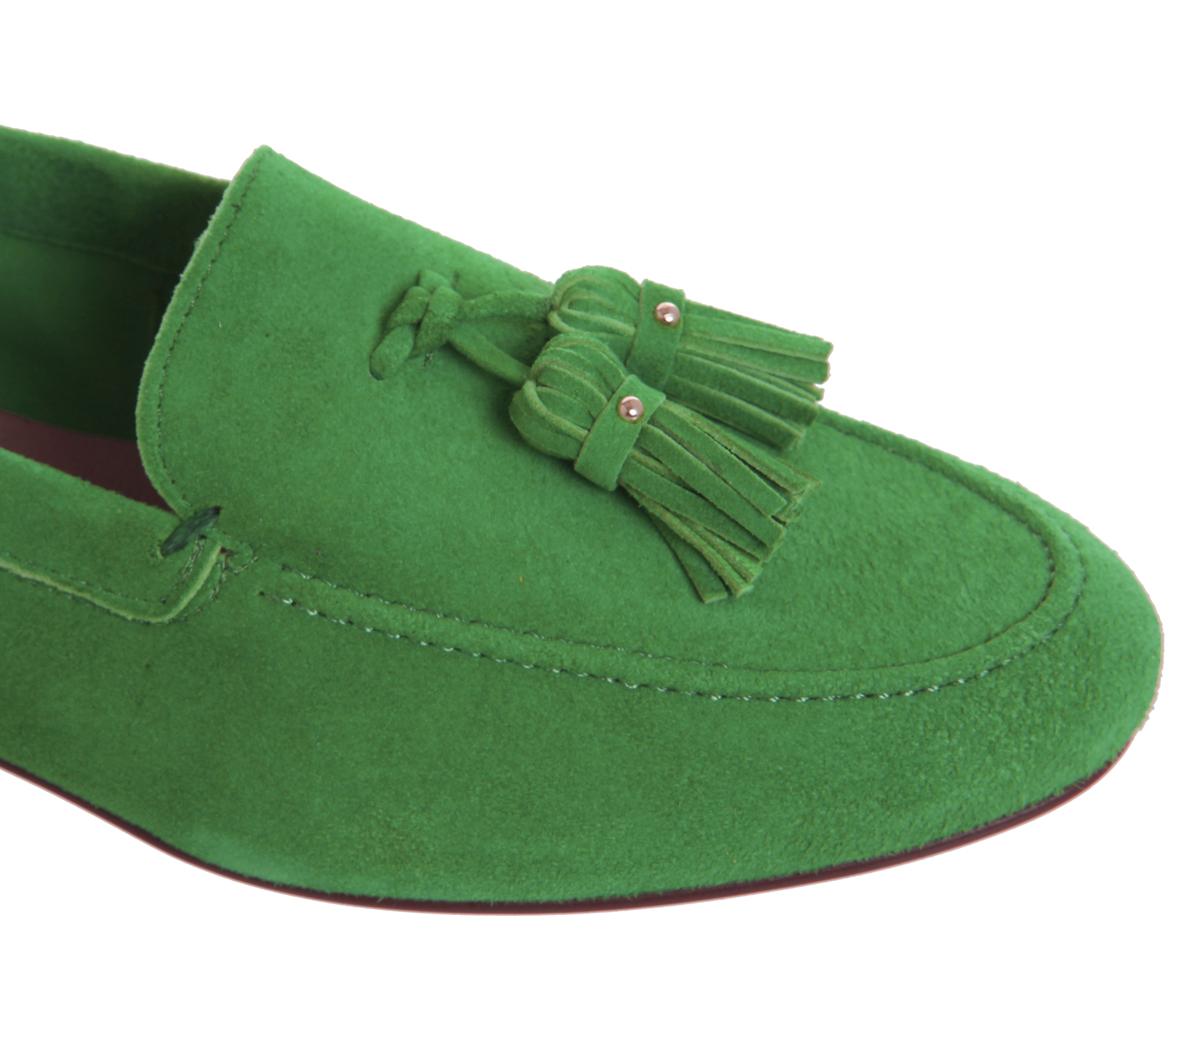 Womens Office Office Office Retro Tassel Loafers GREEN SUEDE Flats b89b17